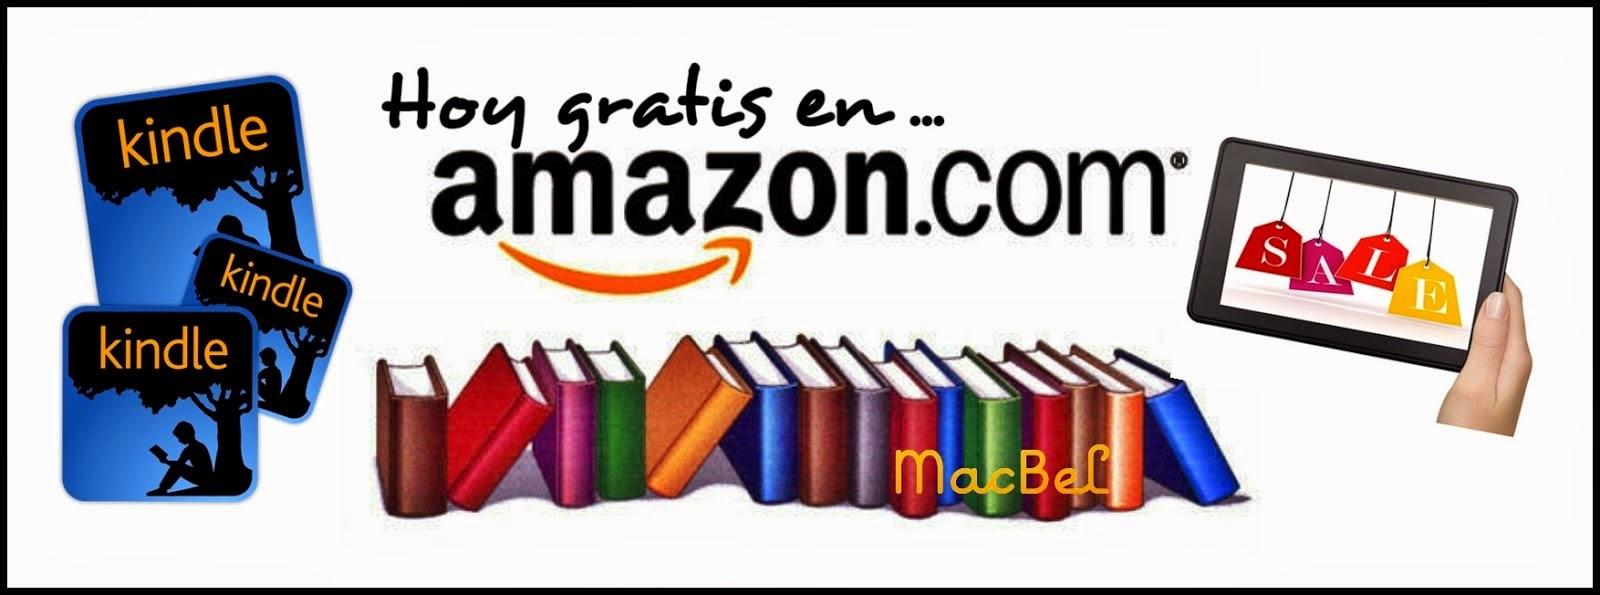 Hoy Gratis en Amazon.com